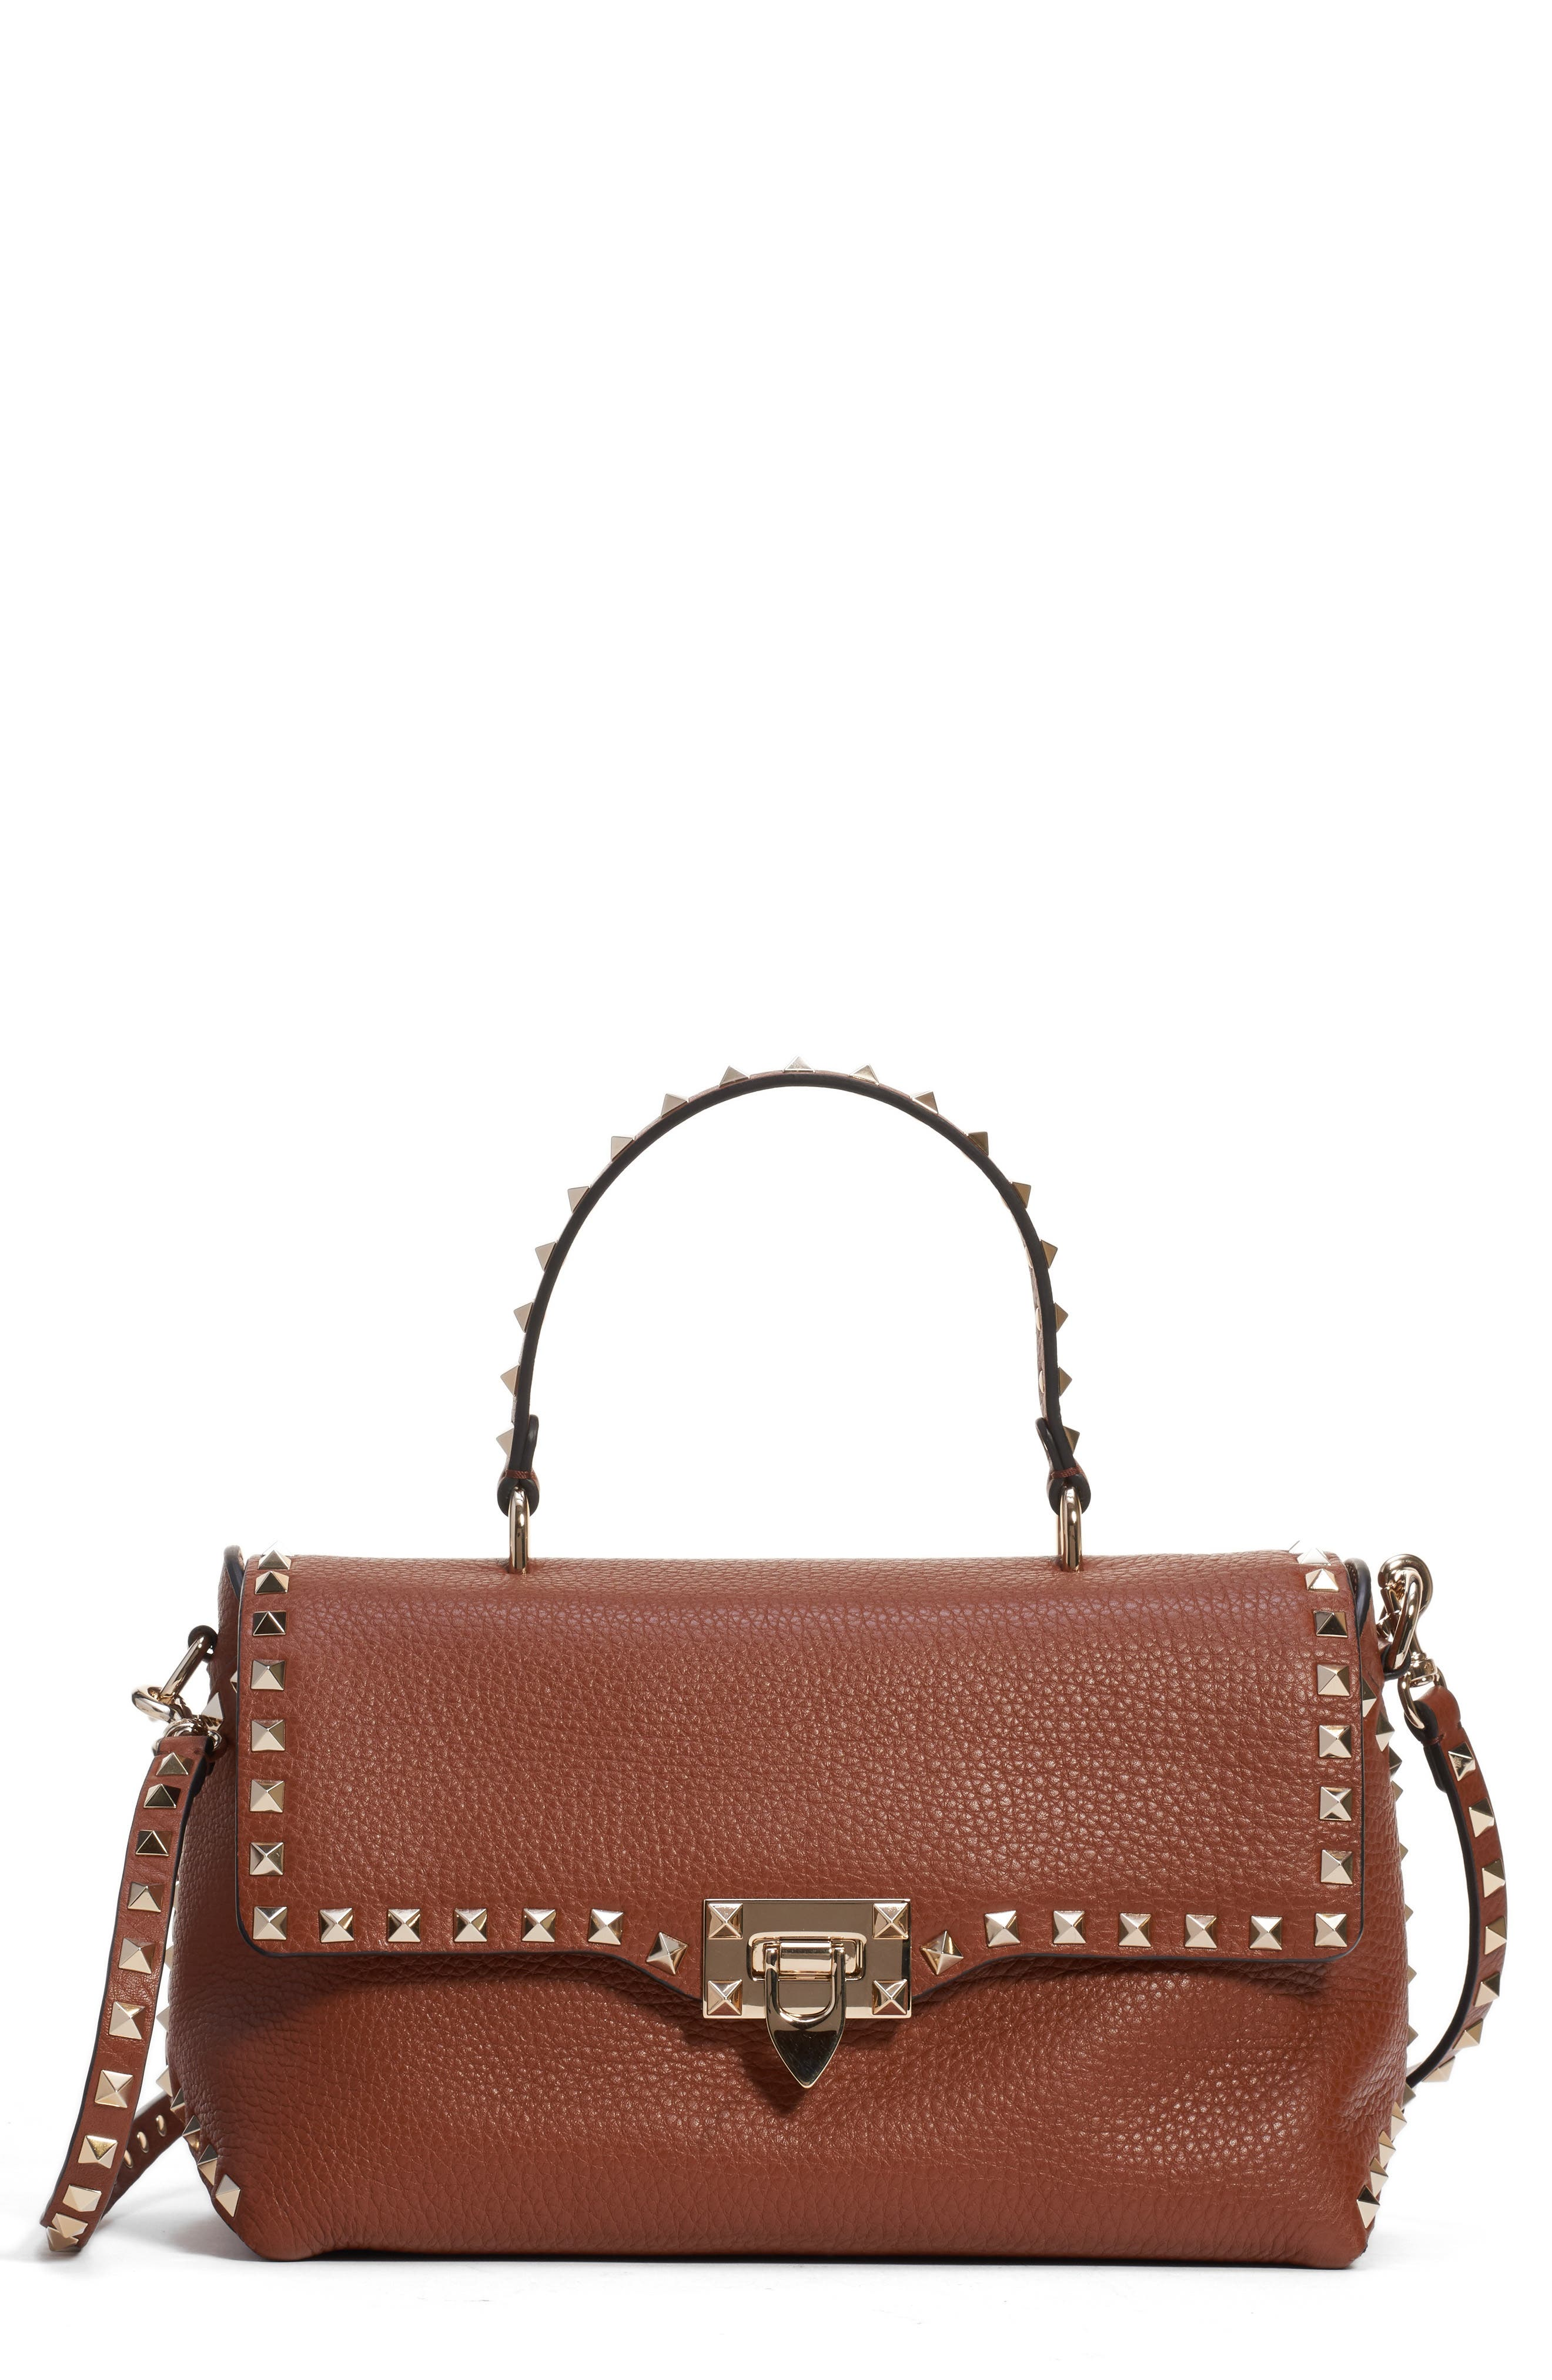 Medium Rockstud Leather Crossbody Bag,                         Main,                         color, BRIGHT COGNAC